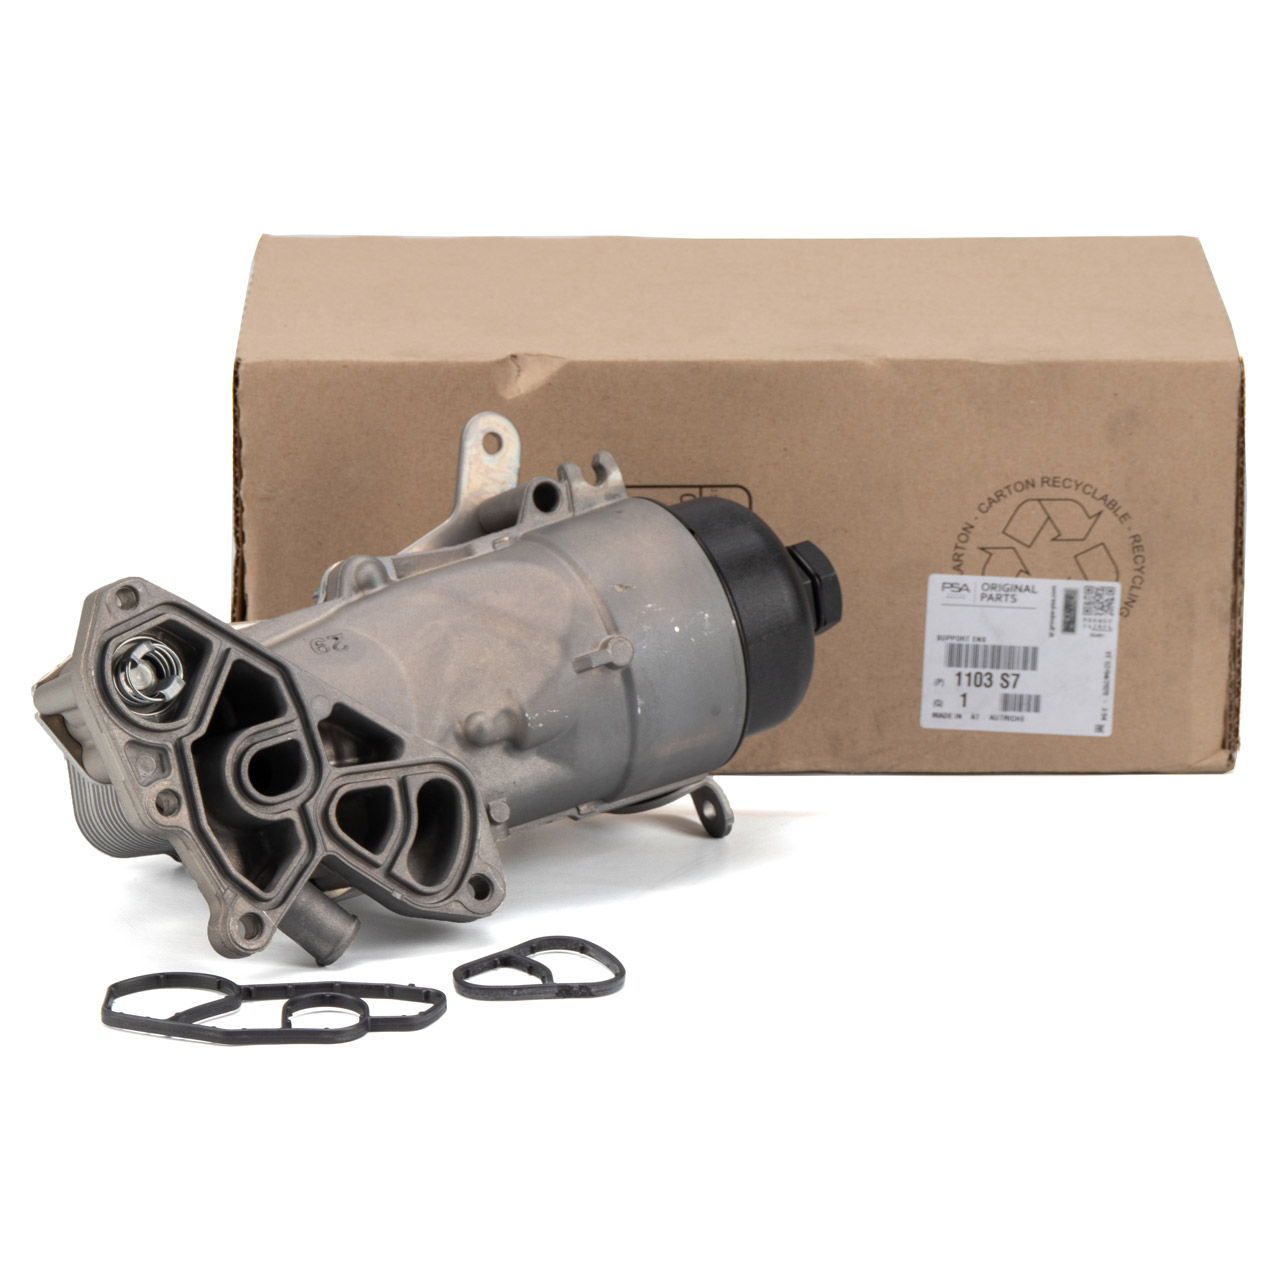 ORIGINAL PSA Ölfiltergehäuse + Ölkühler C3 C4 C5 207 208 308 508 1.6 HDi 1103.S7